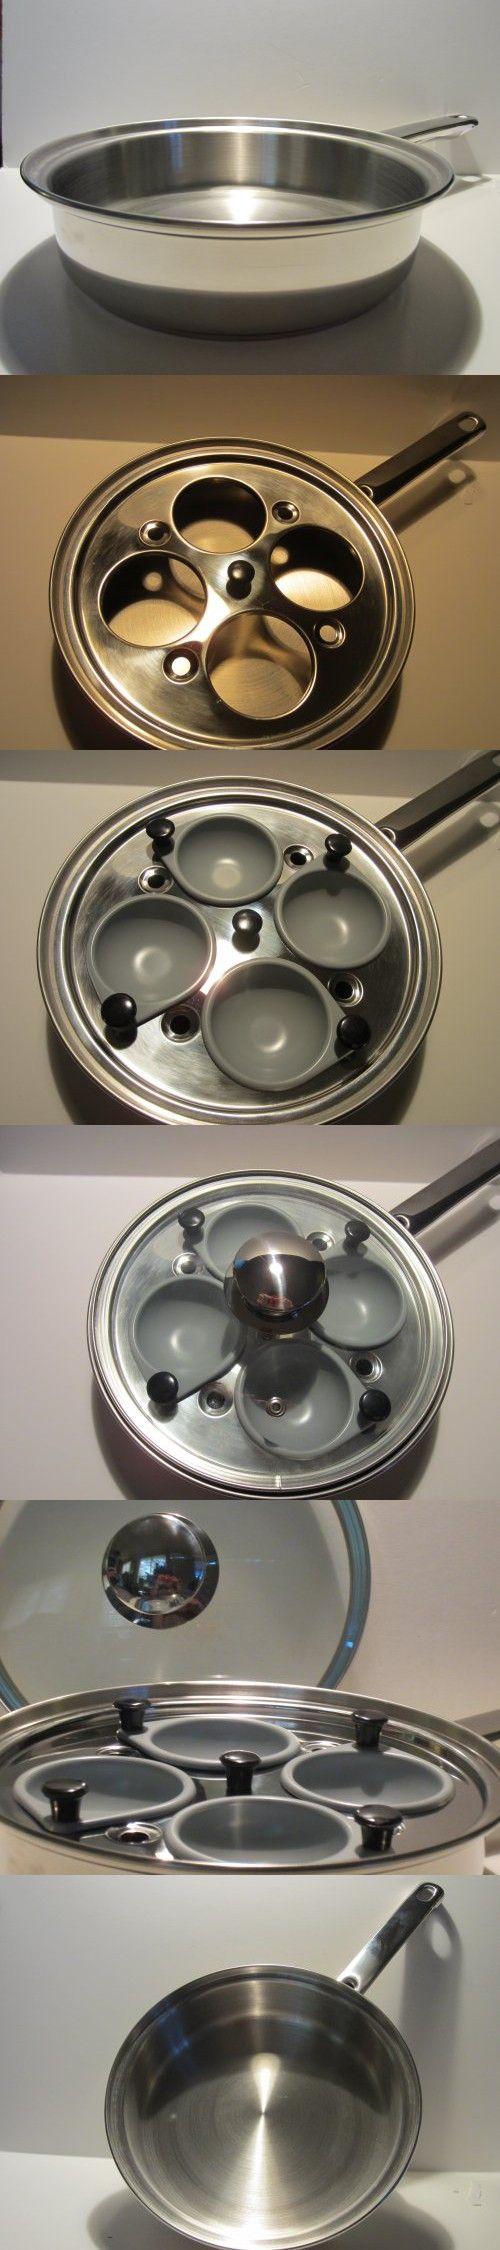 HIC Stainless Steel 4 Egg Poacher Pan